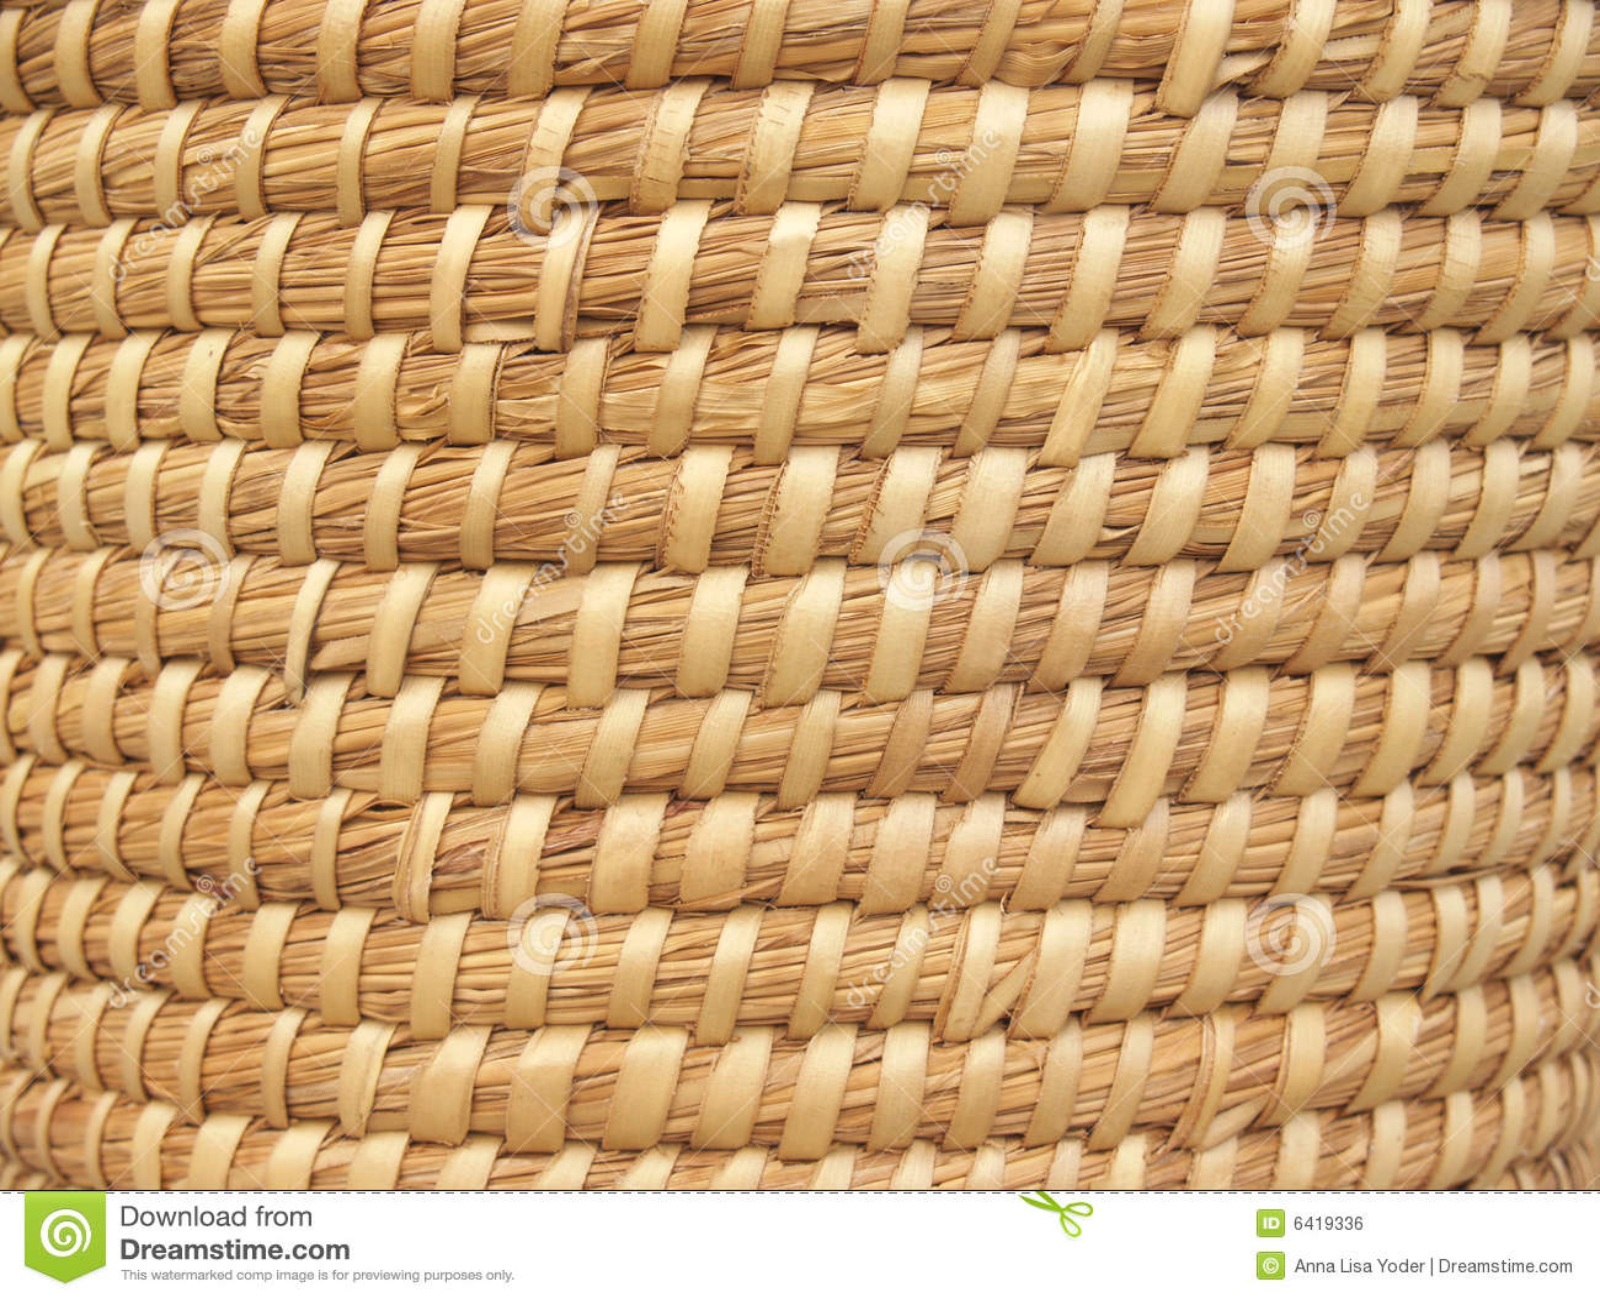 Coil Basket Weaving Patterns : Natural basket weave background royalty free stock image